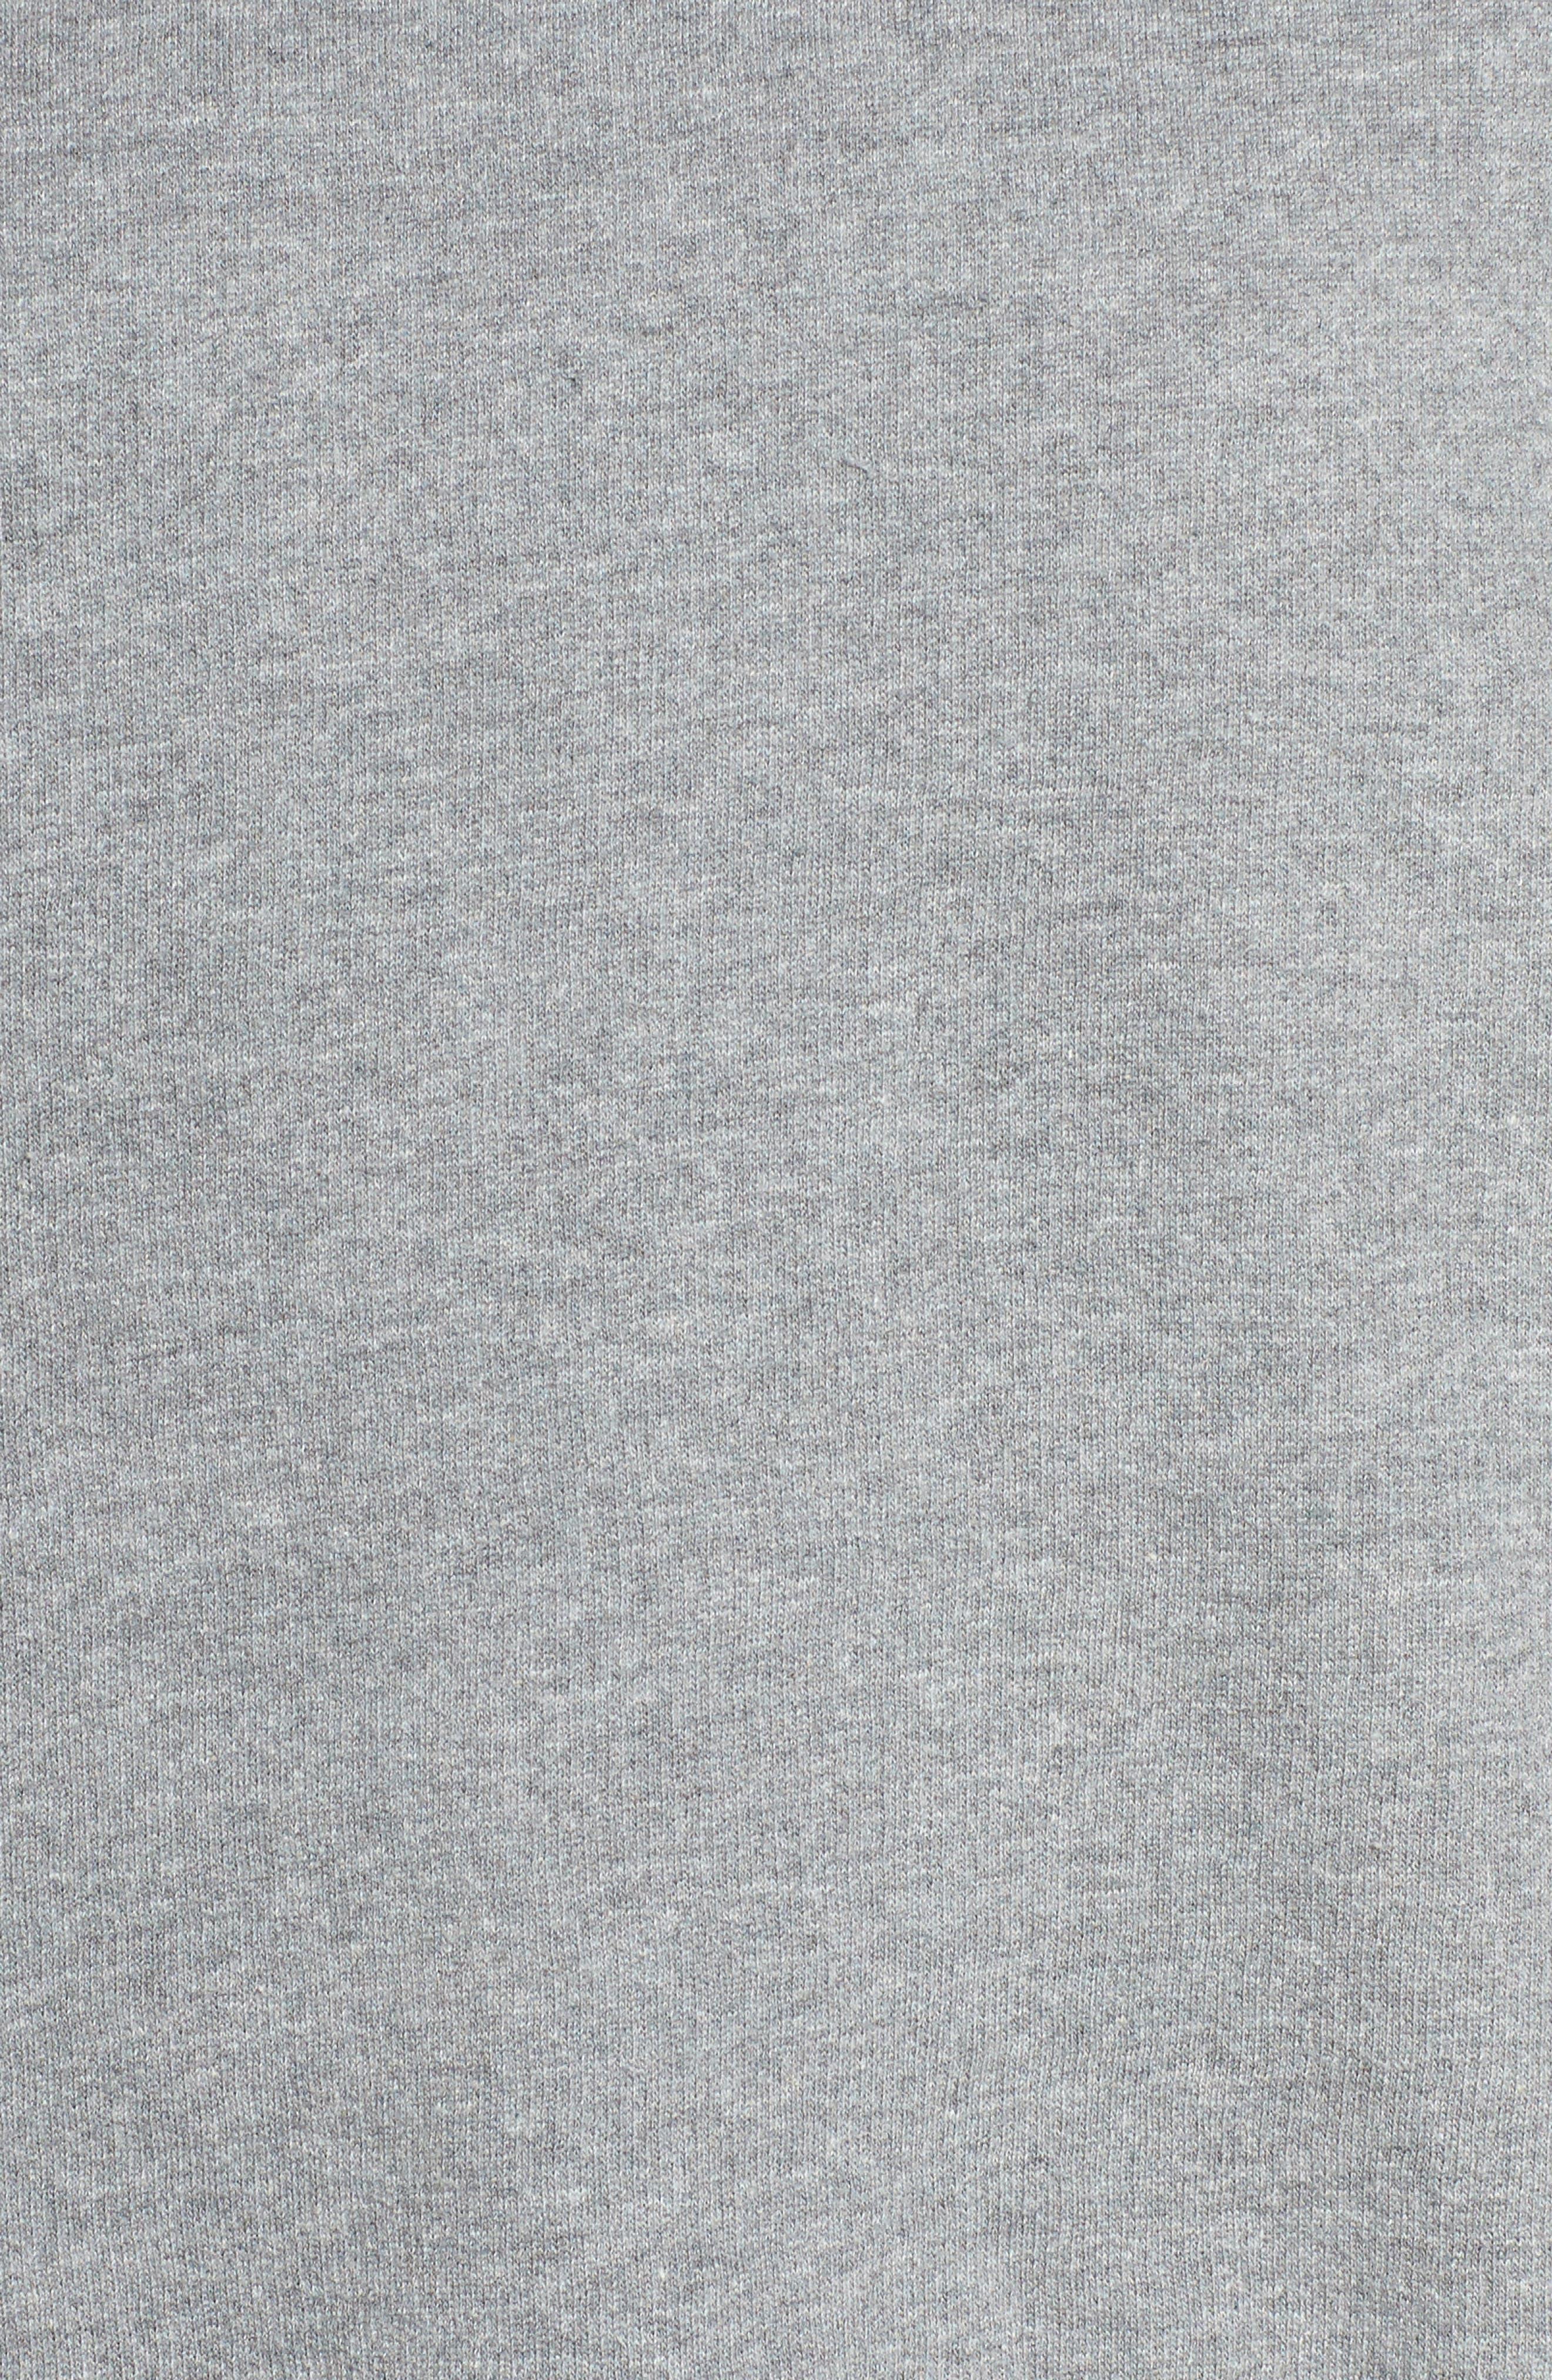 Blonde Crewneck Sweatshirt,                             Alternate thumbnail 5, color,                             Heather Grey